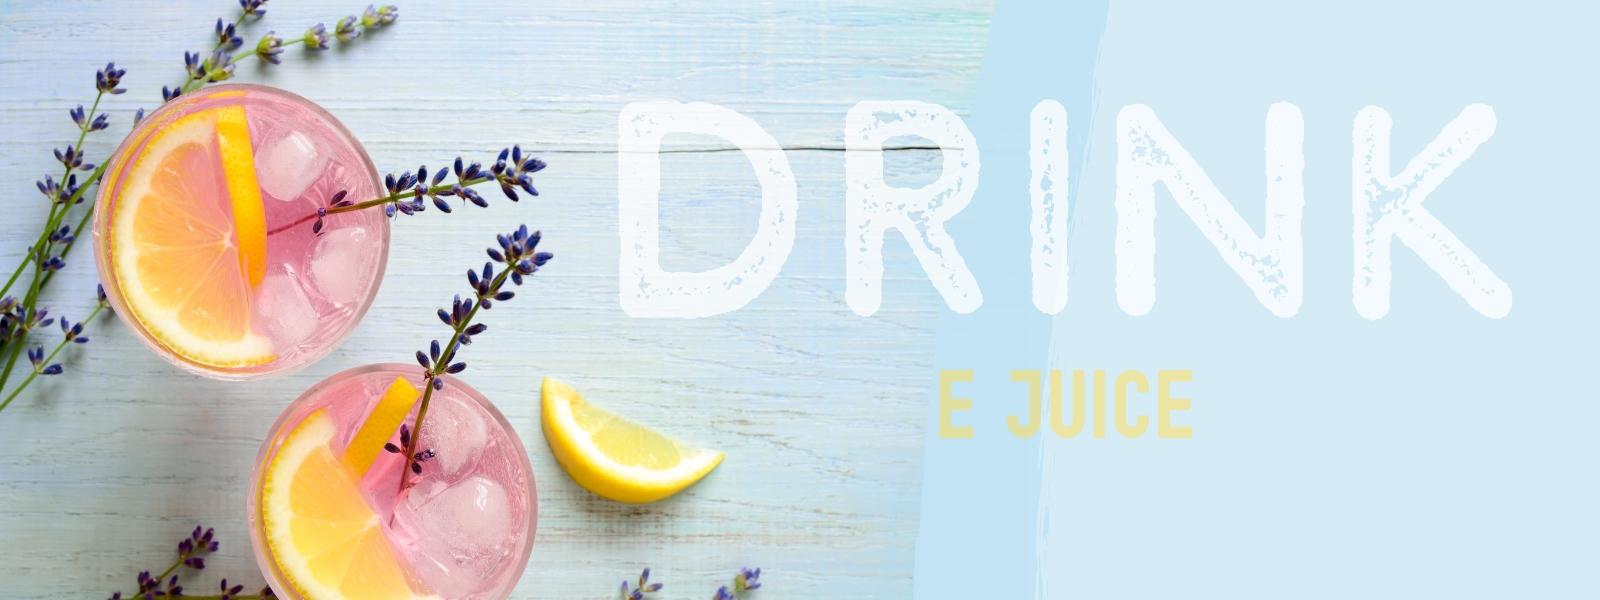 Drink Ejuice